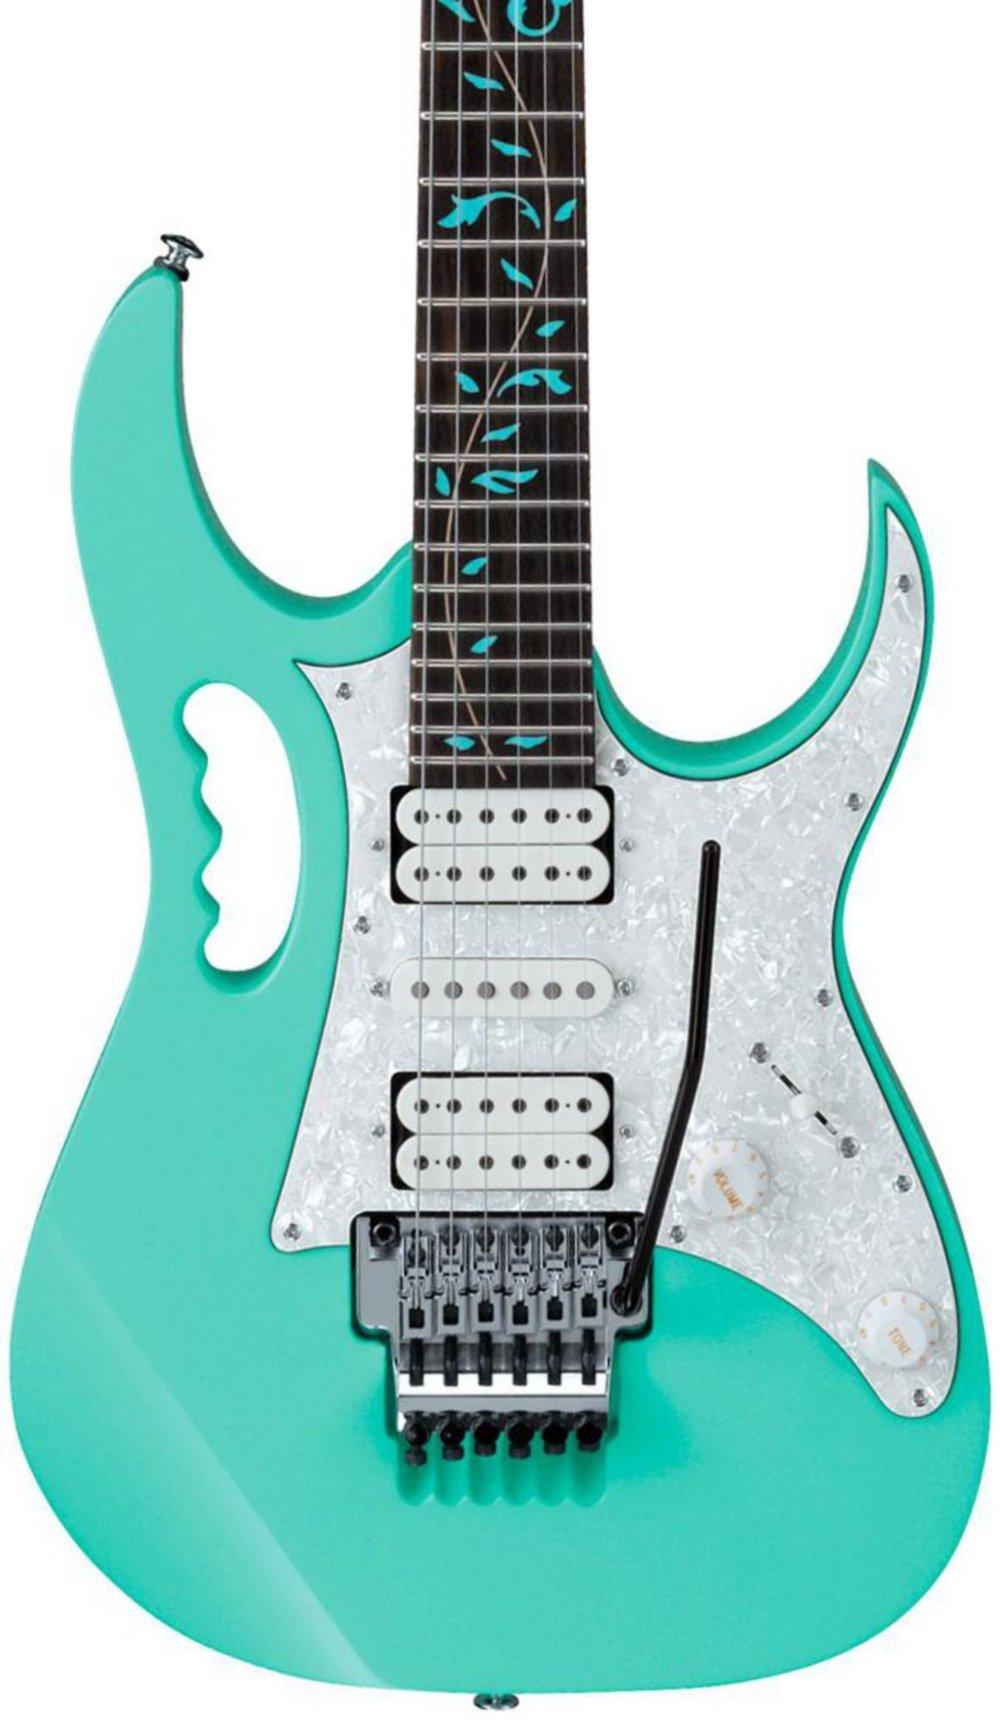 Cheap Ibanez JEM/UV Steve Vai Signature Electric Guitar Sea Foam Green 190839002389 Black Friday & Cyber Monday 2019